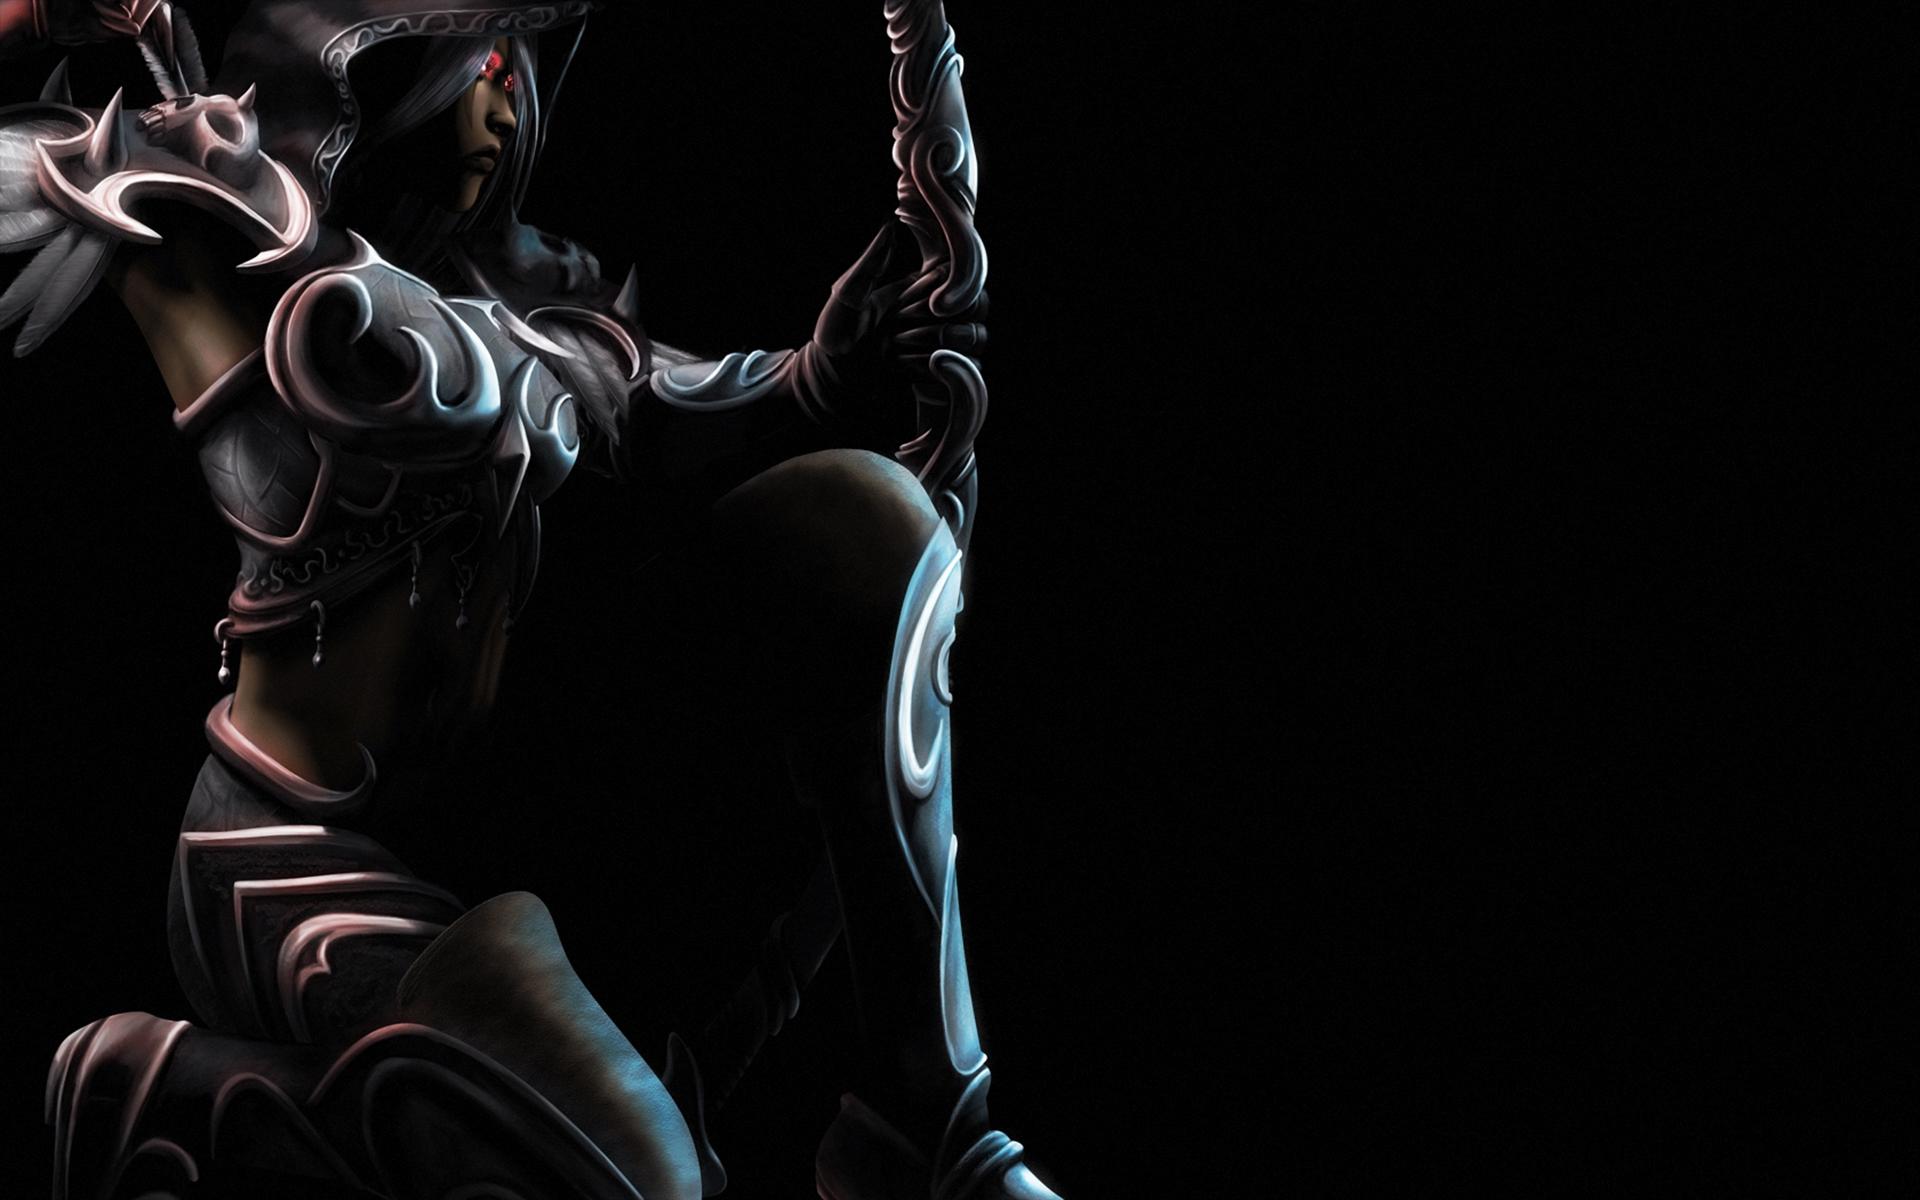 Warrior in the dark hd wallpaper background image 1920x1200 id 107015 wallpaper abyss - Sylvanas windrunner wallpaper ...